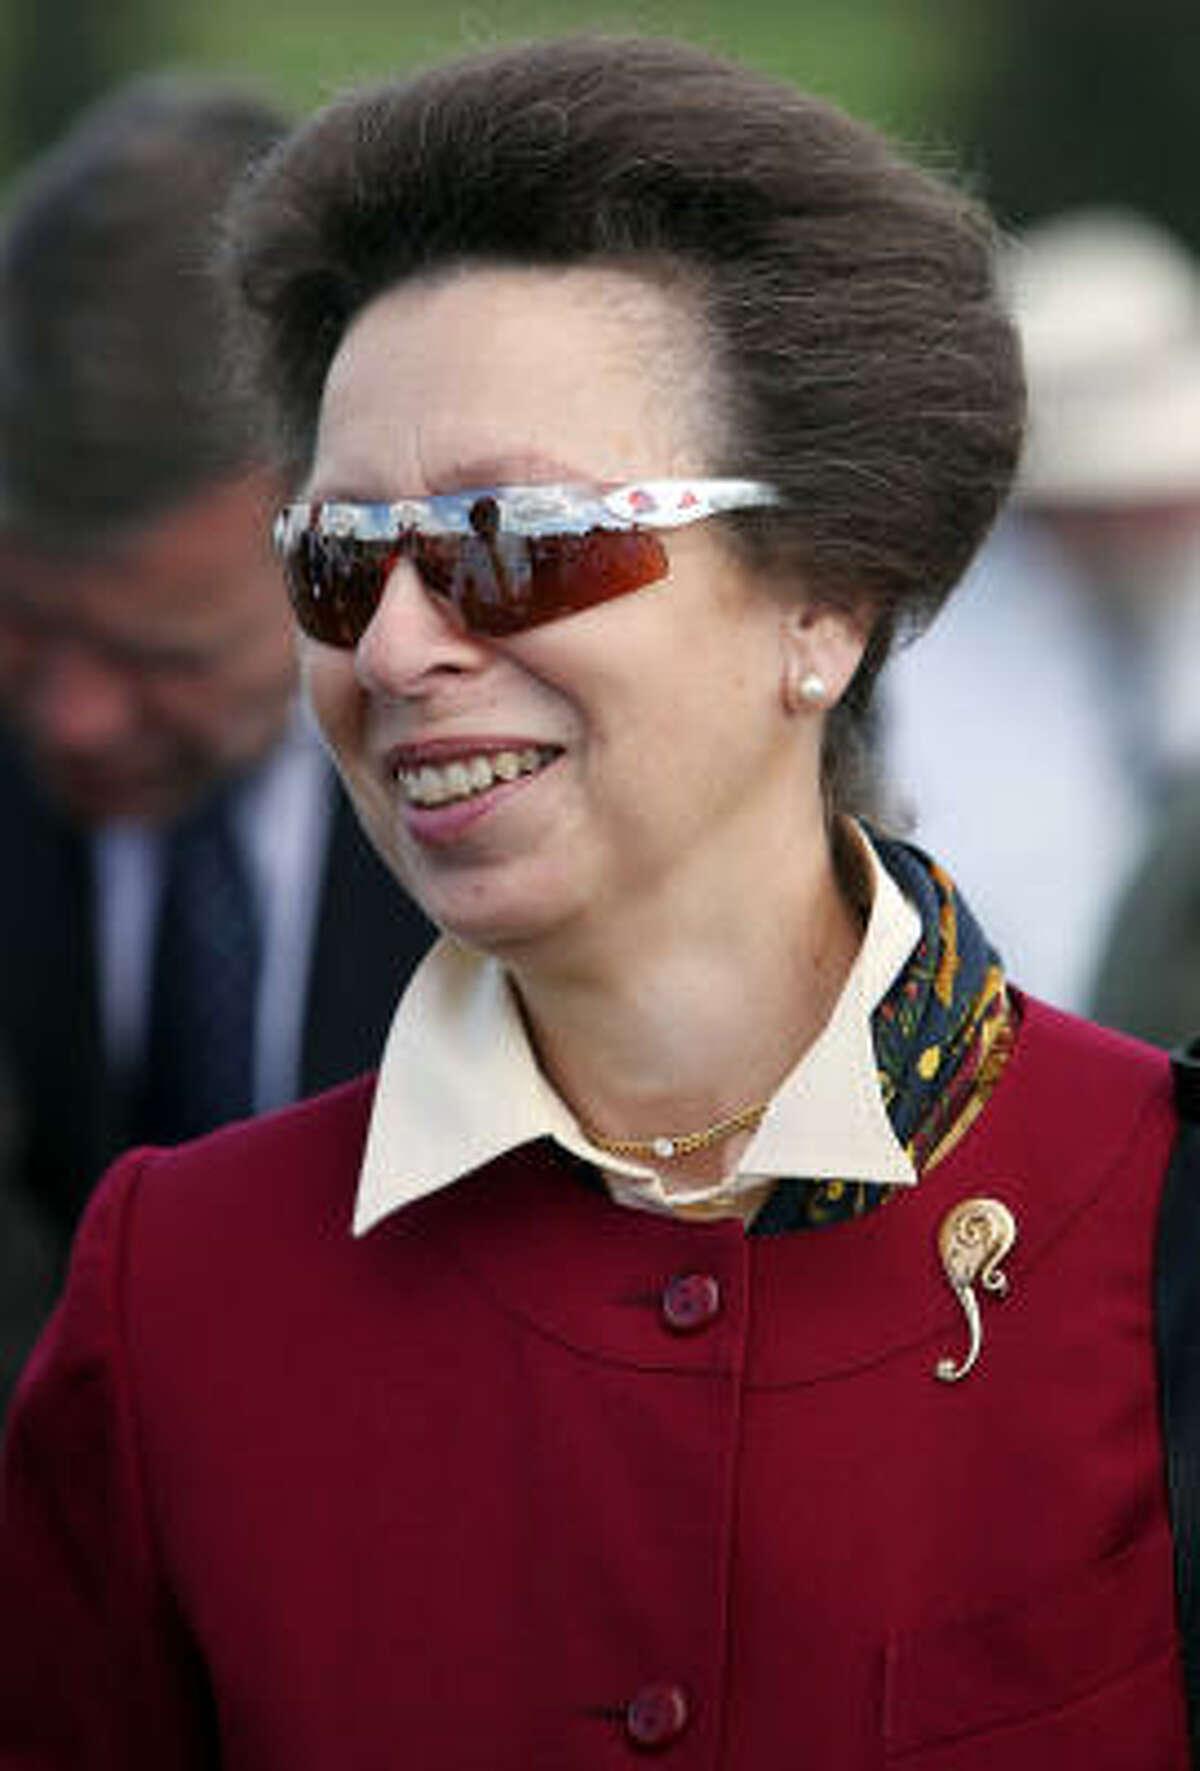 Princess Anne wears Team GB Olympic sunglasses.